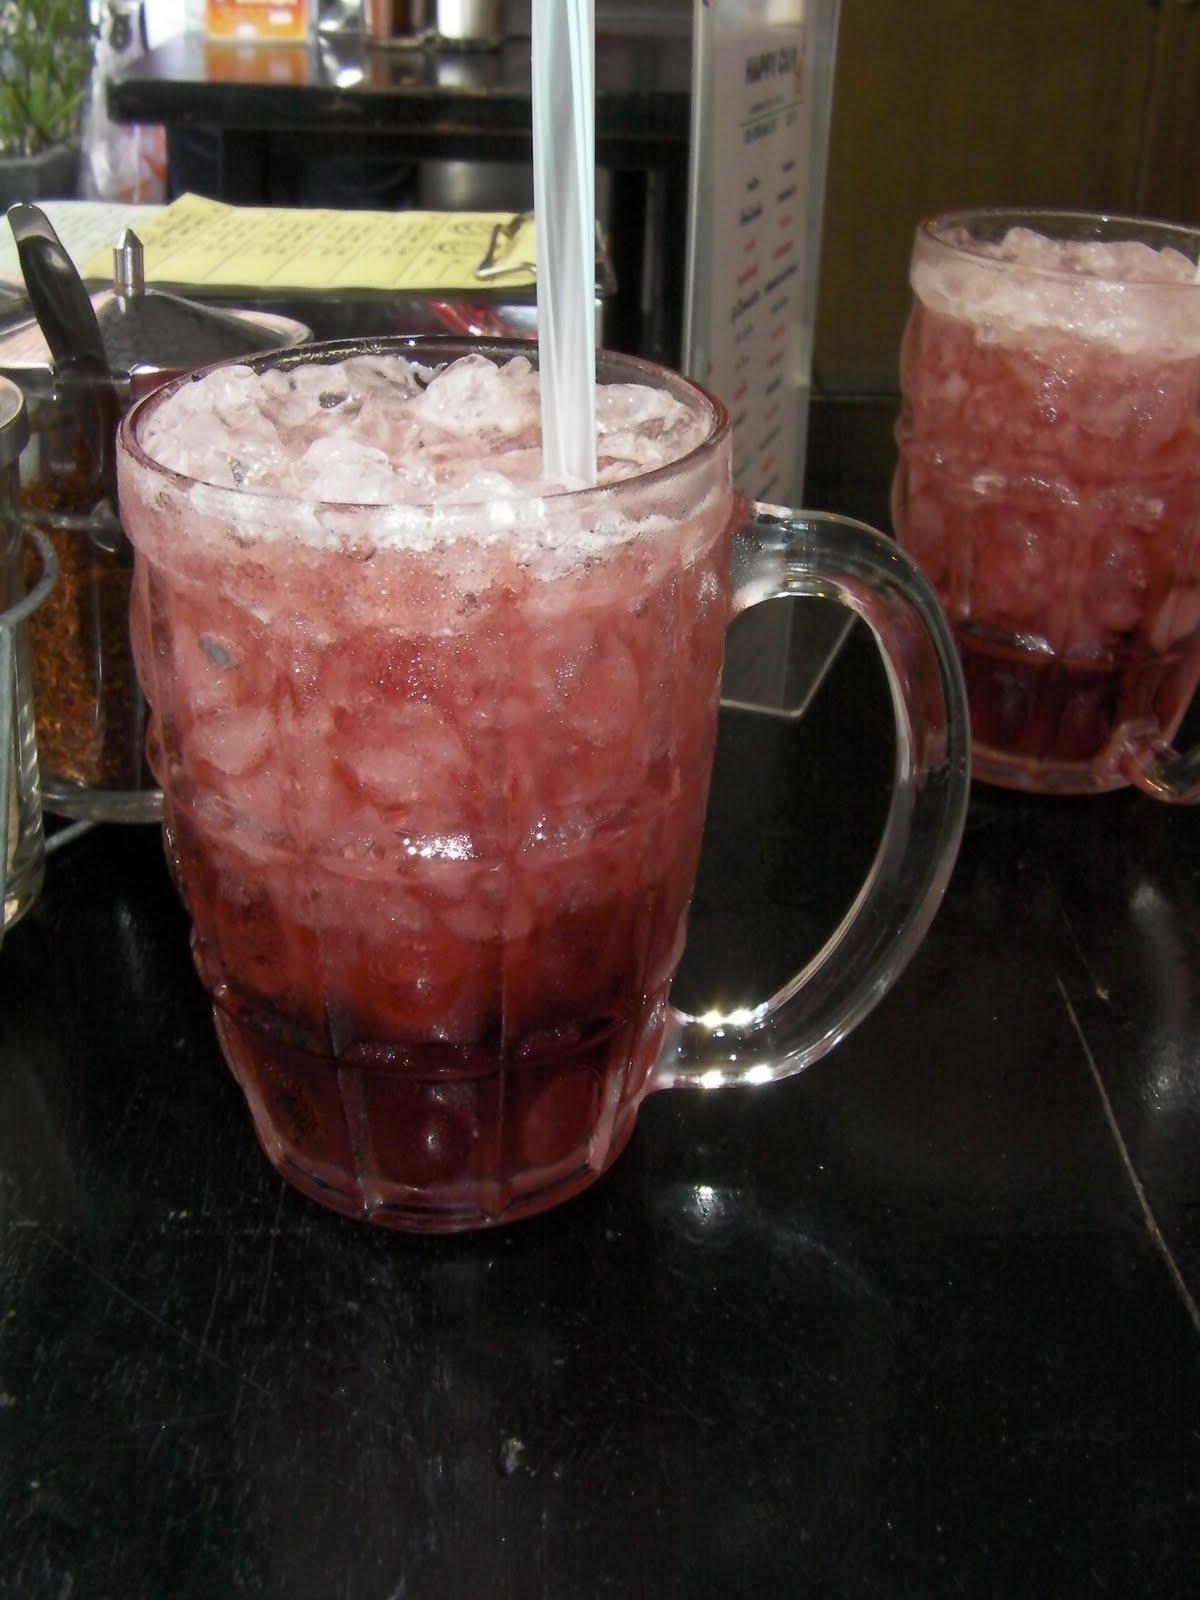 Dick in fizzy drink